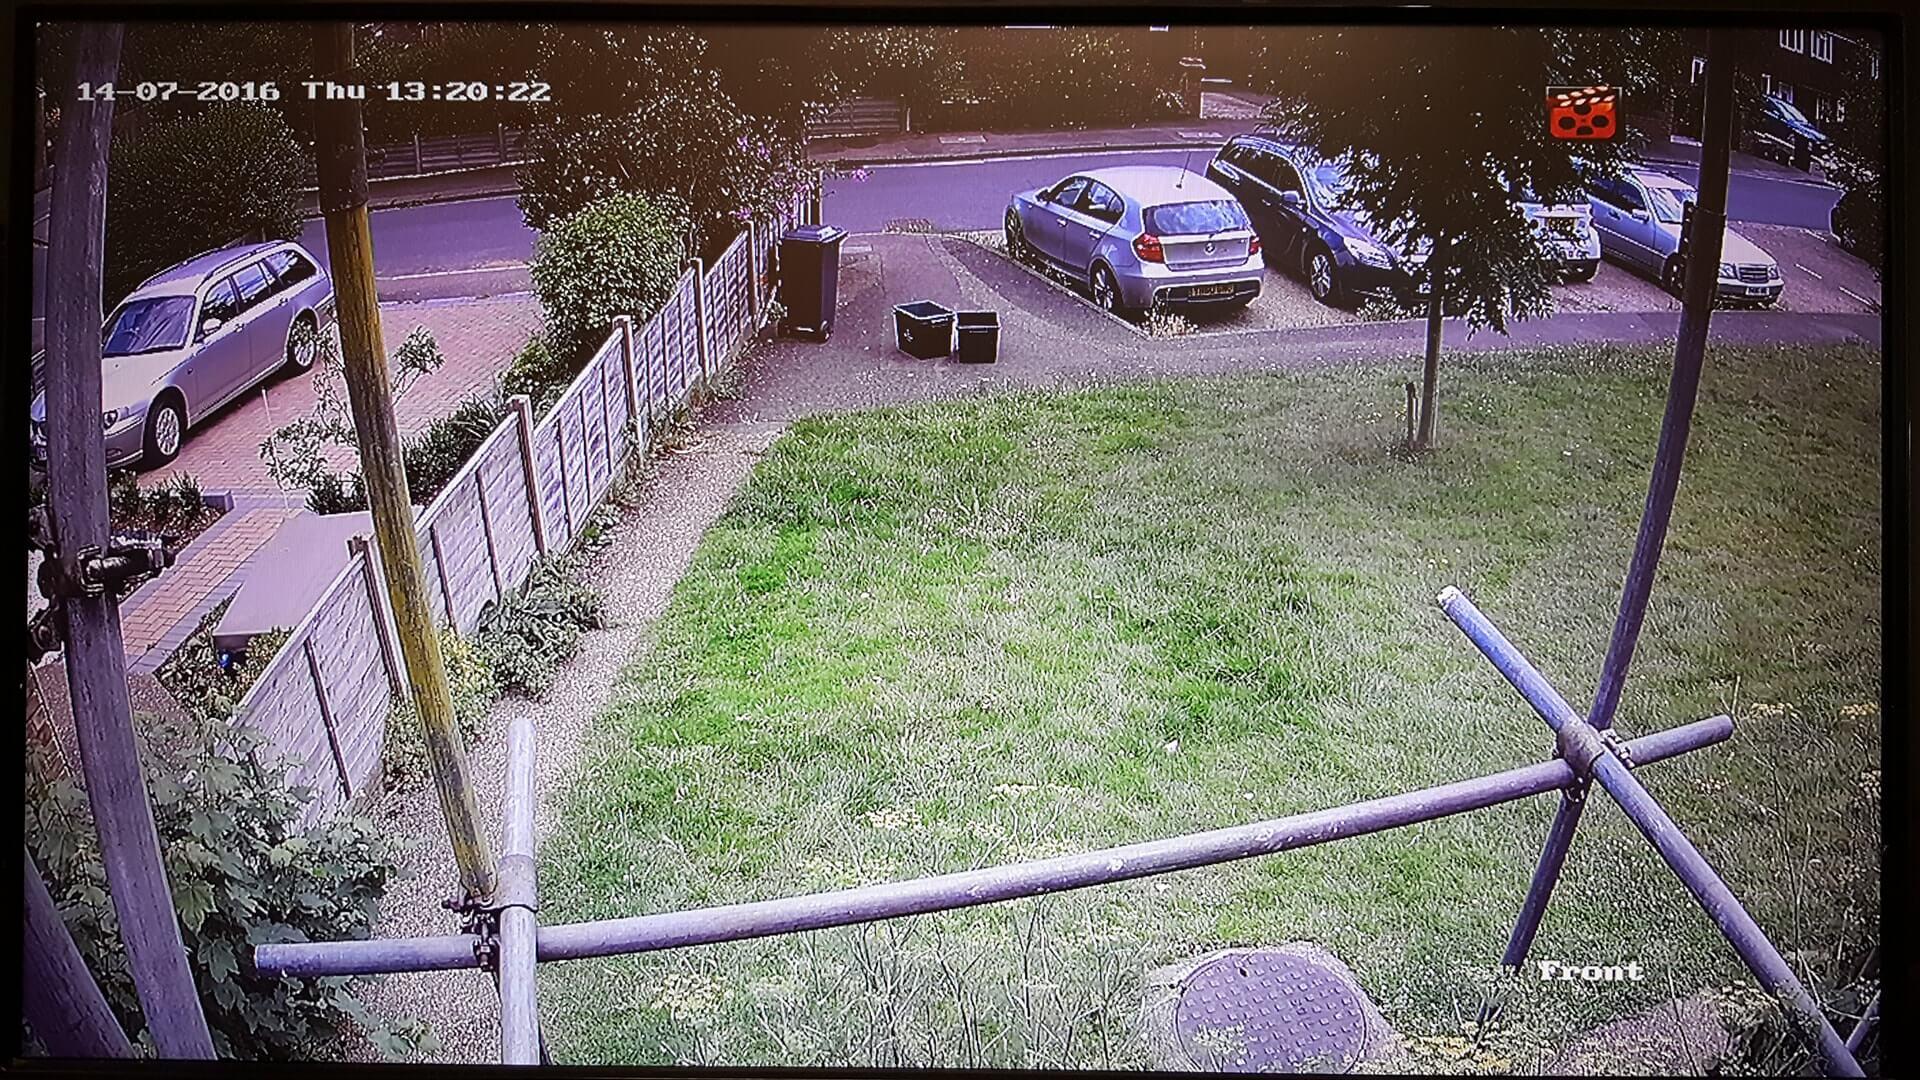 Analogue CCTV Upgrade Turbo HD